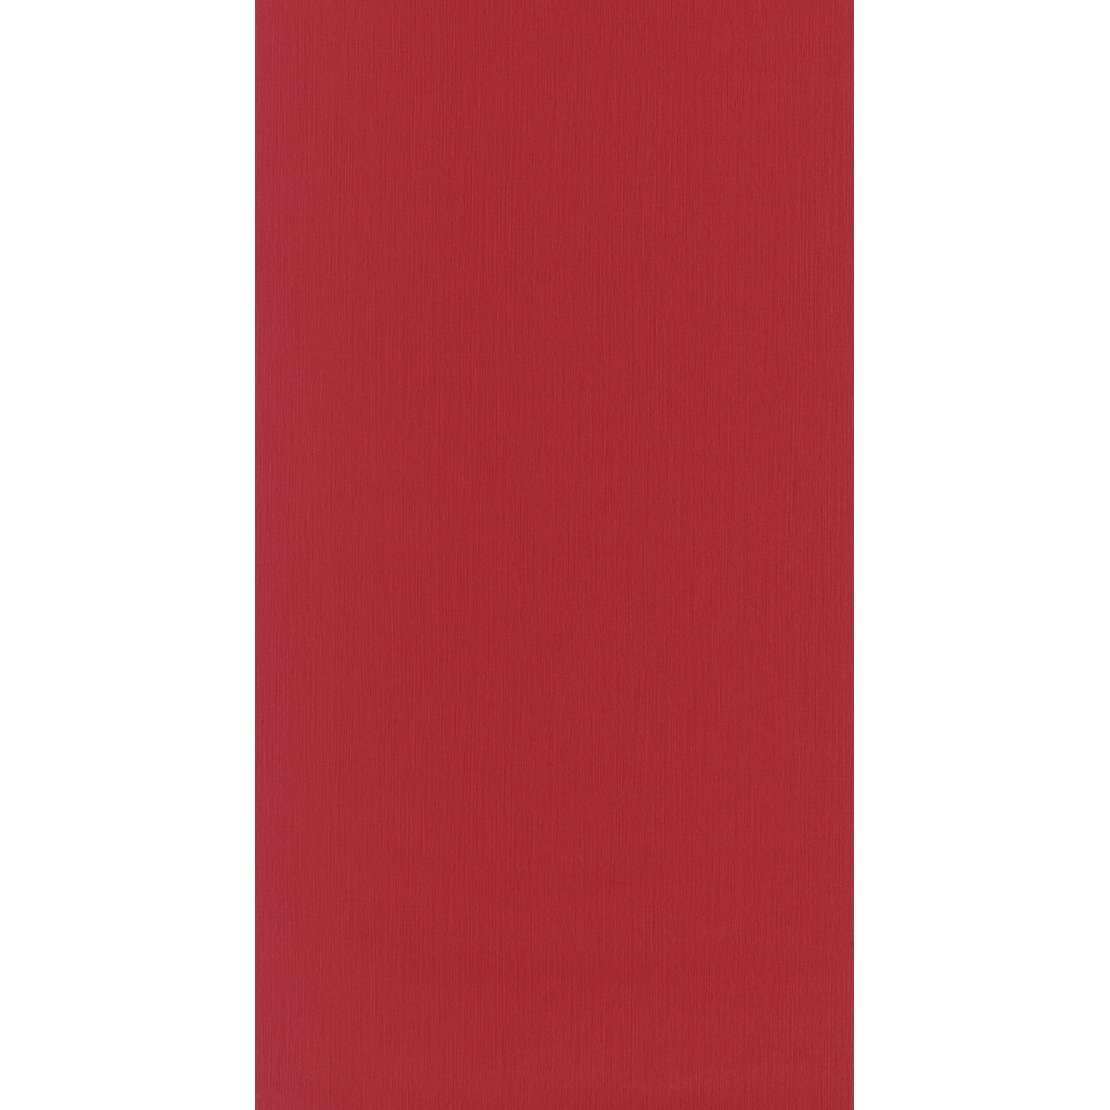 Обои Casadeco Signature 0,53 м. (Касадеко) SIGN82088135